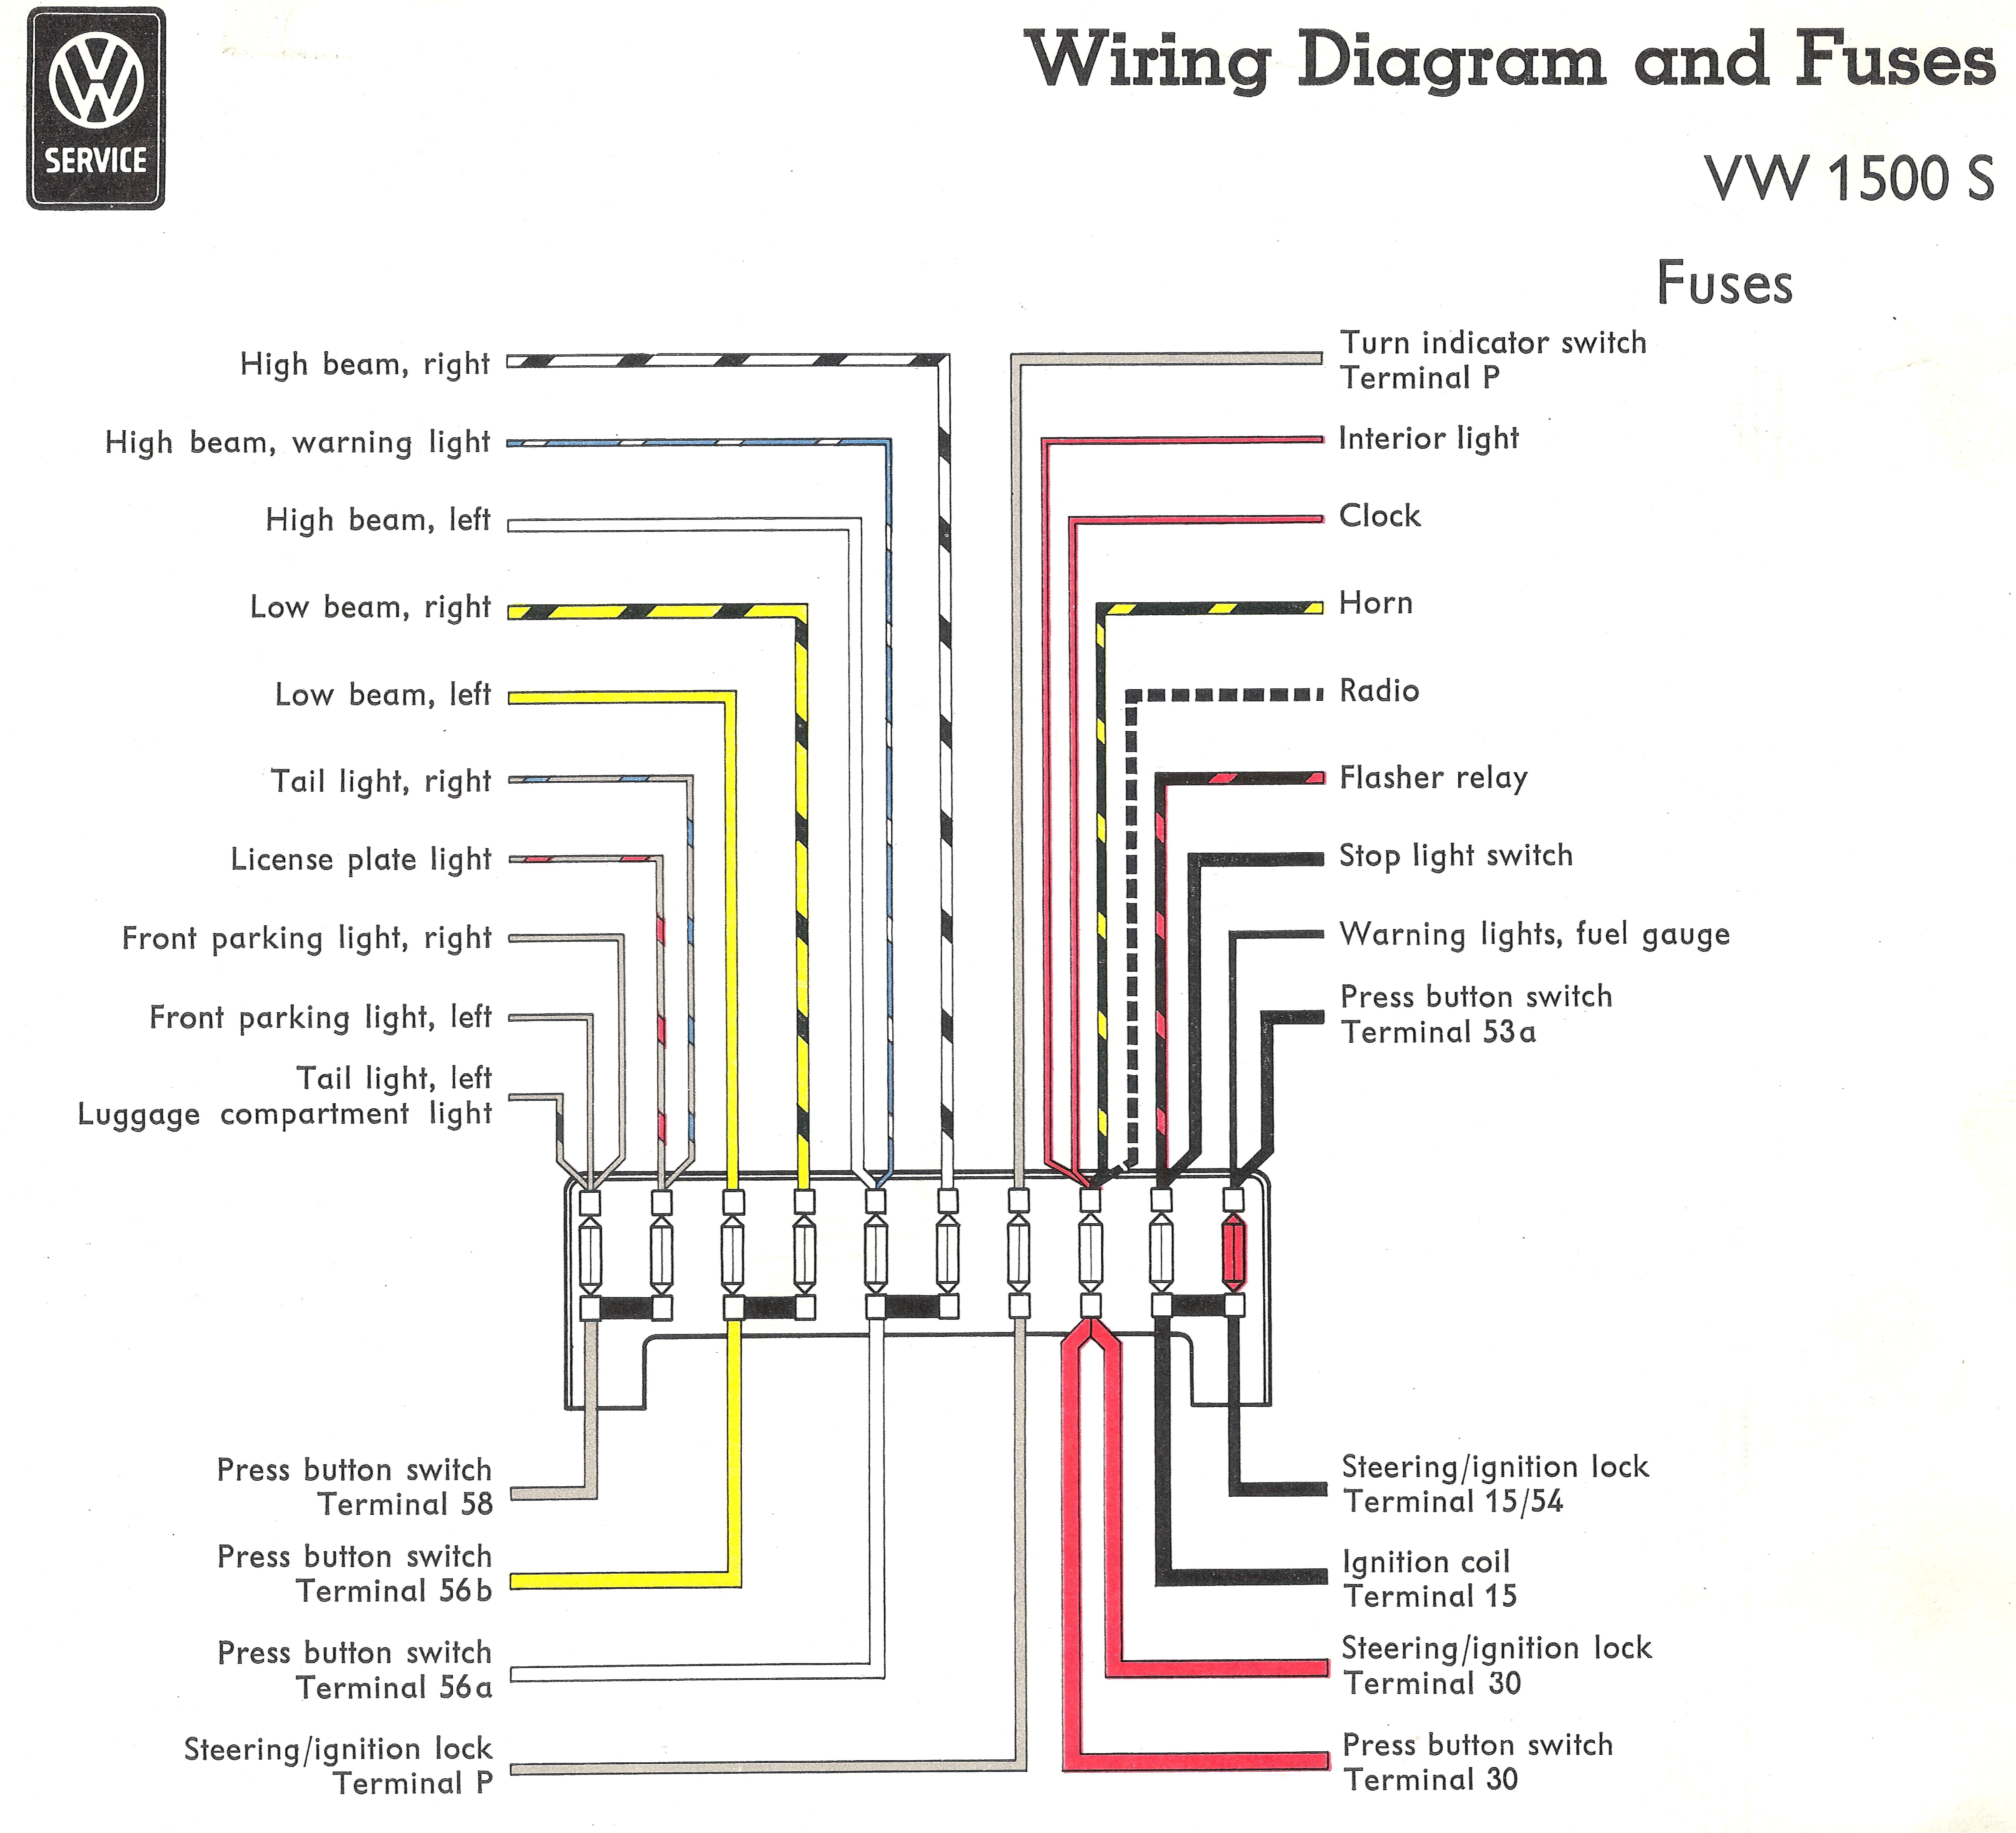 1968 vw bug fuse box wiring diagram namevw bug fuse box wiring diagram article review 1968